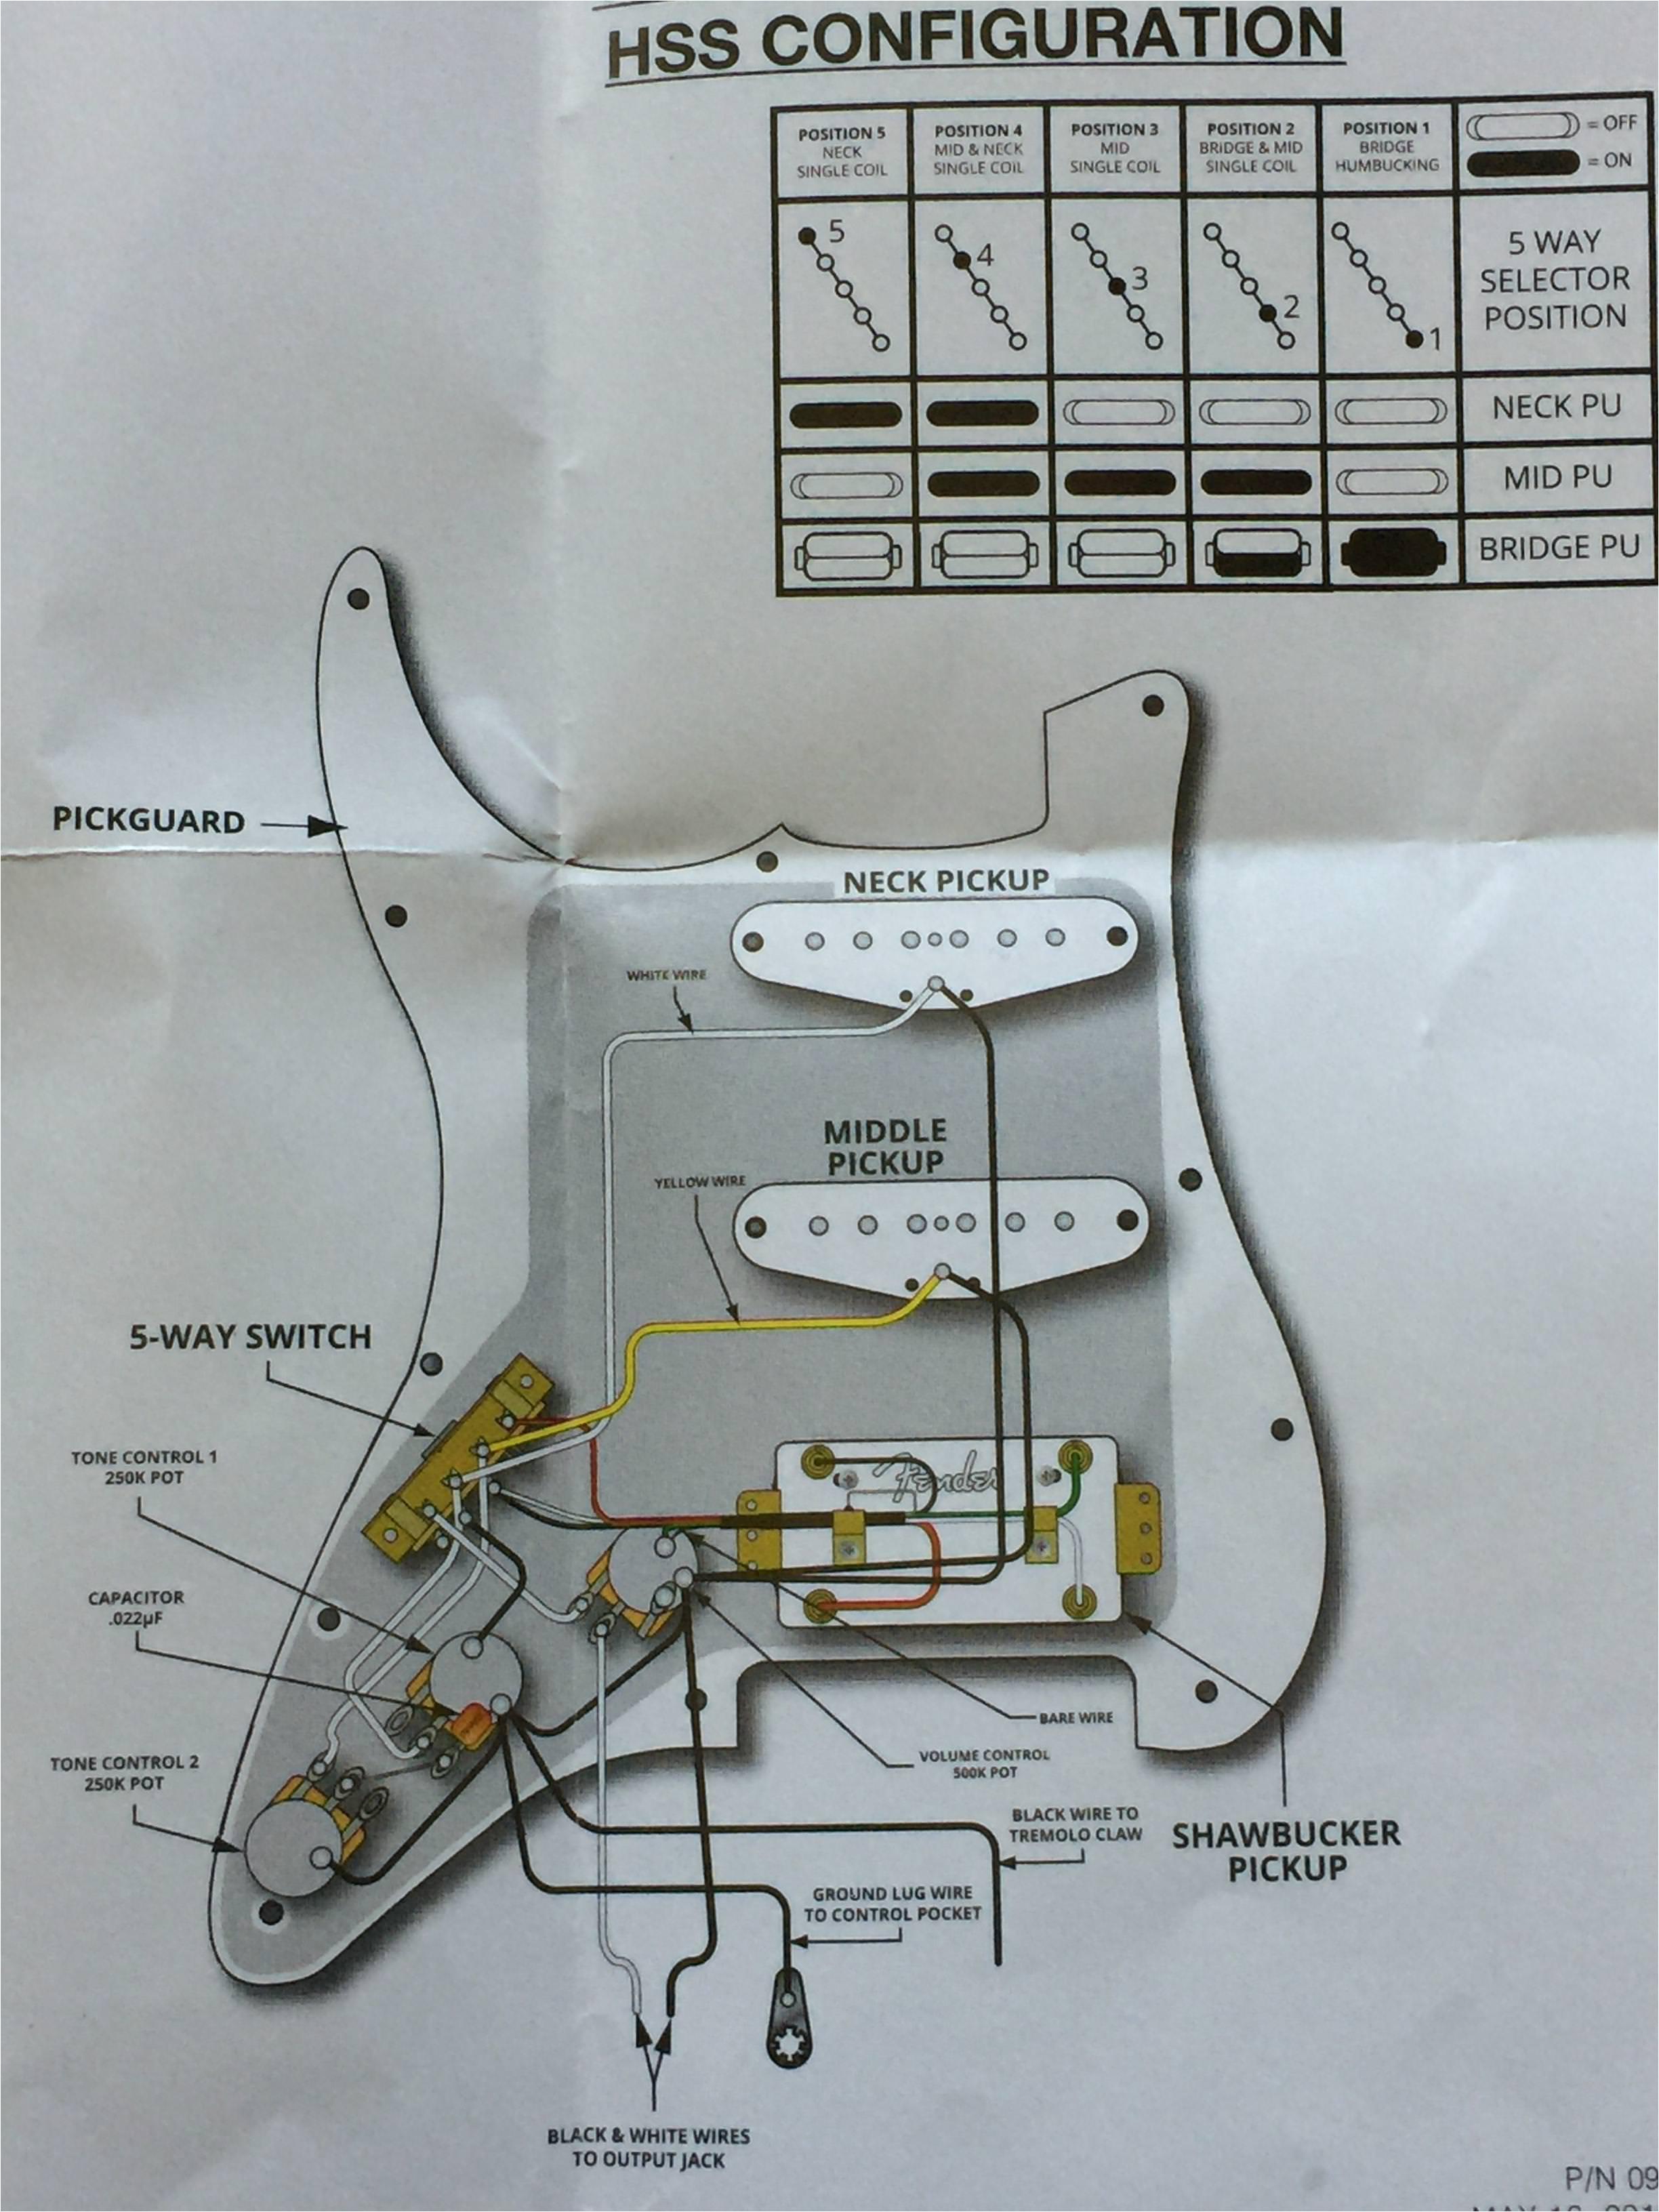 fender guitar hss wiring diagram wiring diagram rules fender standard stratocaster hss wiring diagram fender standard strat hss wiring diagram